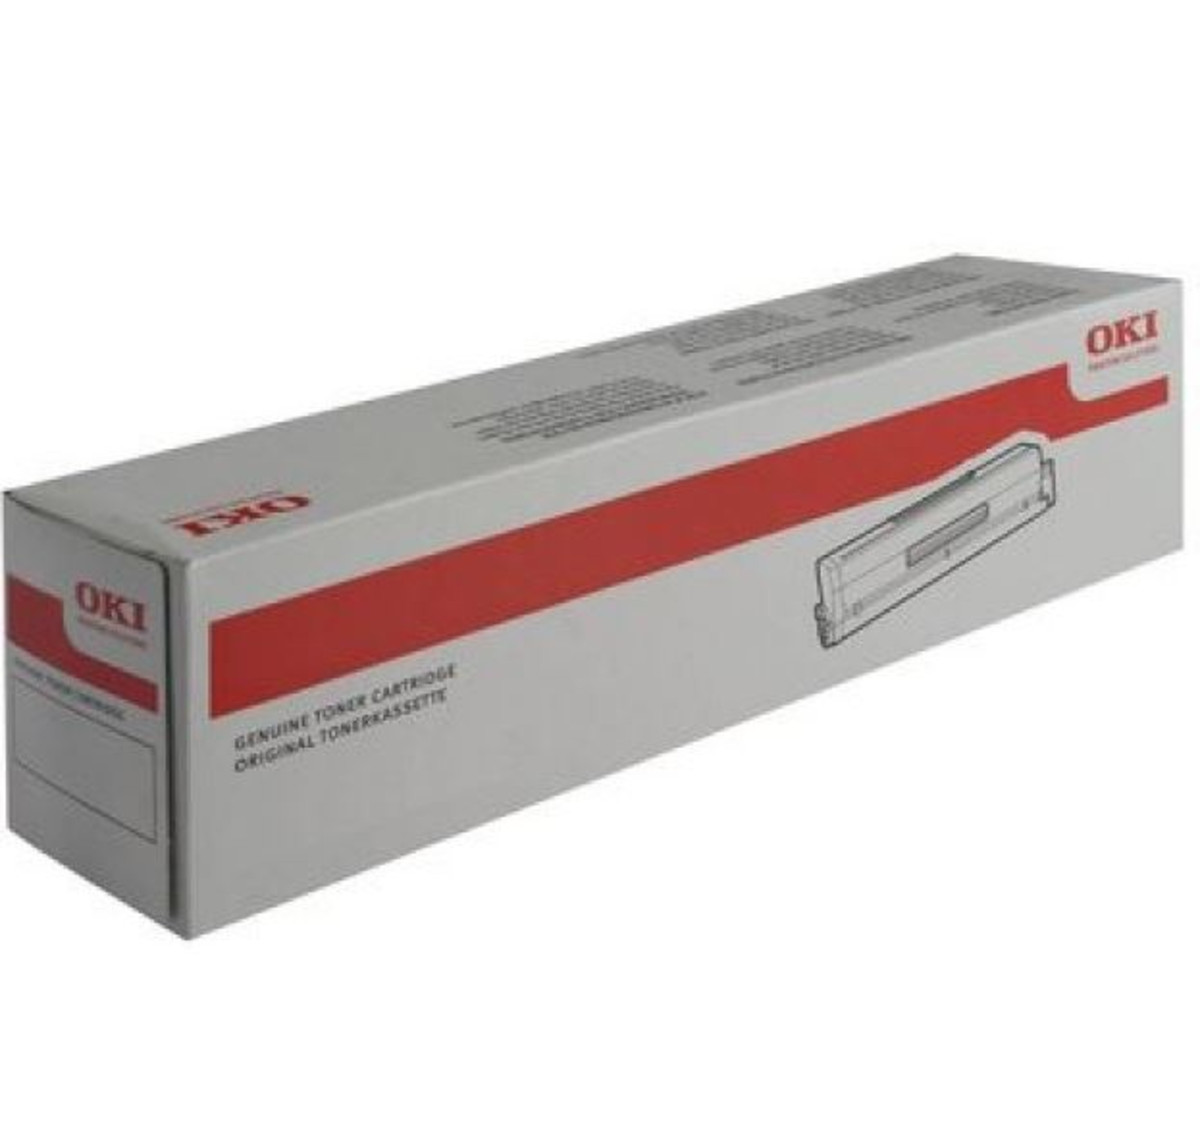 OKI 44992407 Black Toner Cartridge